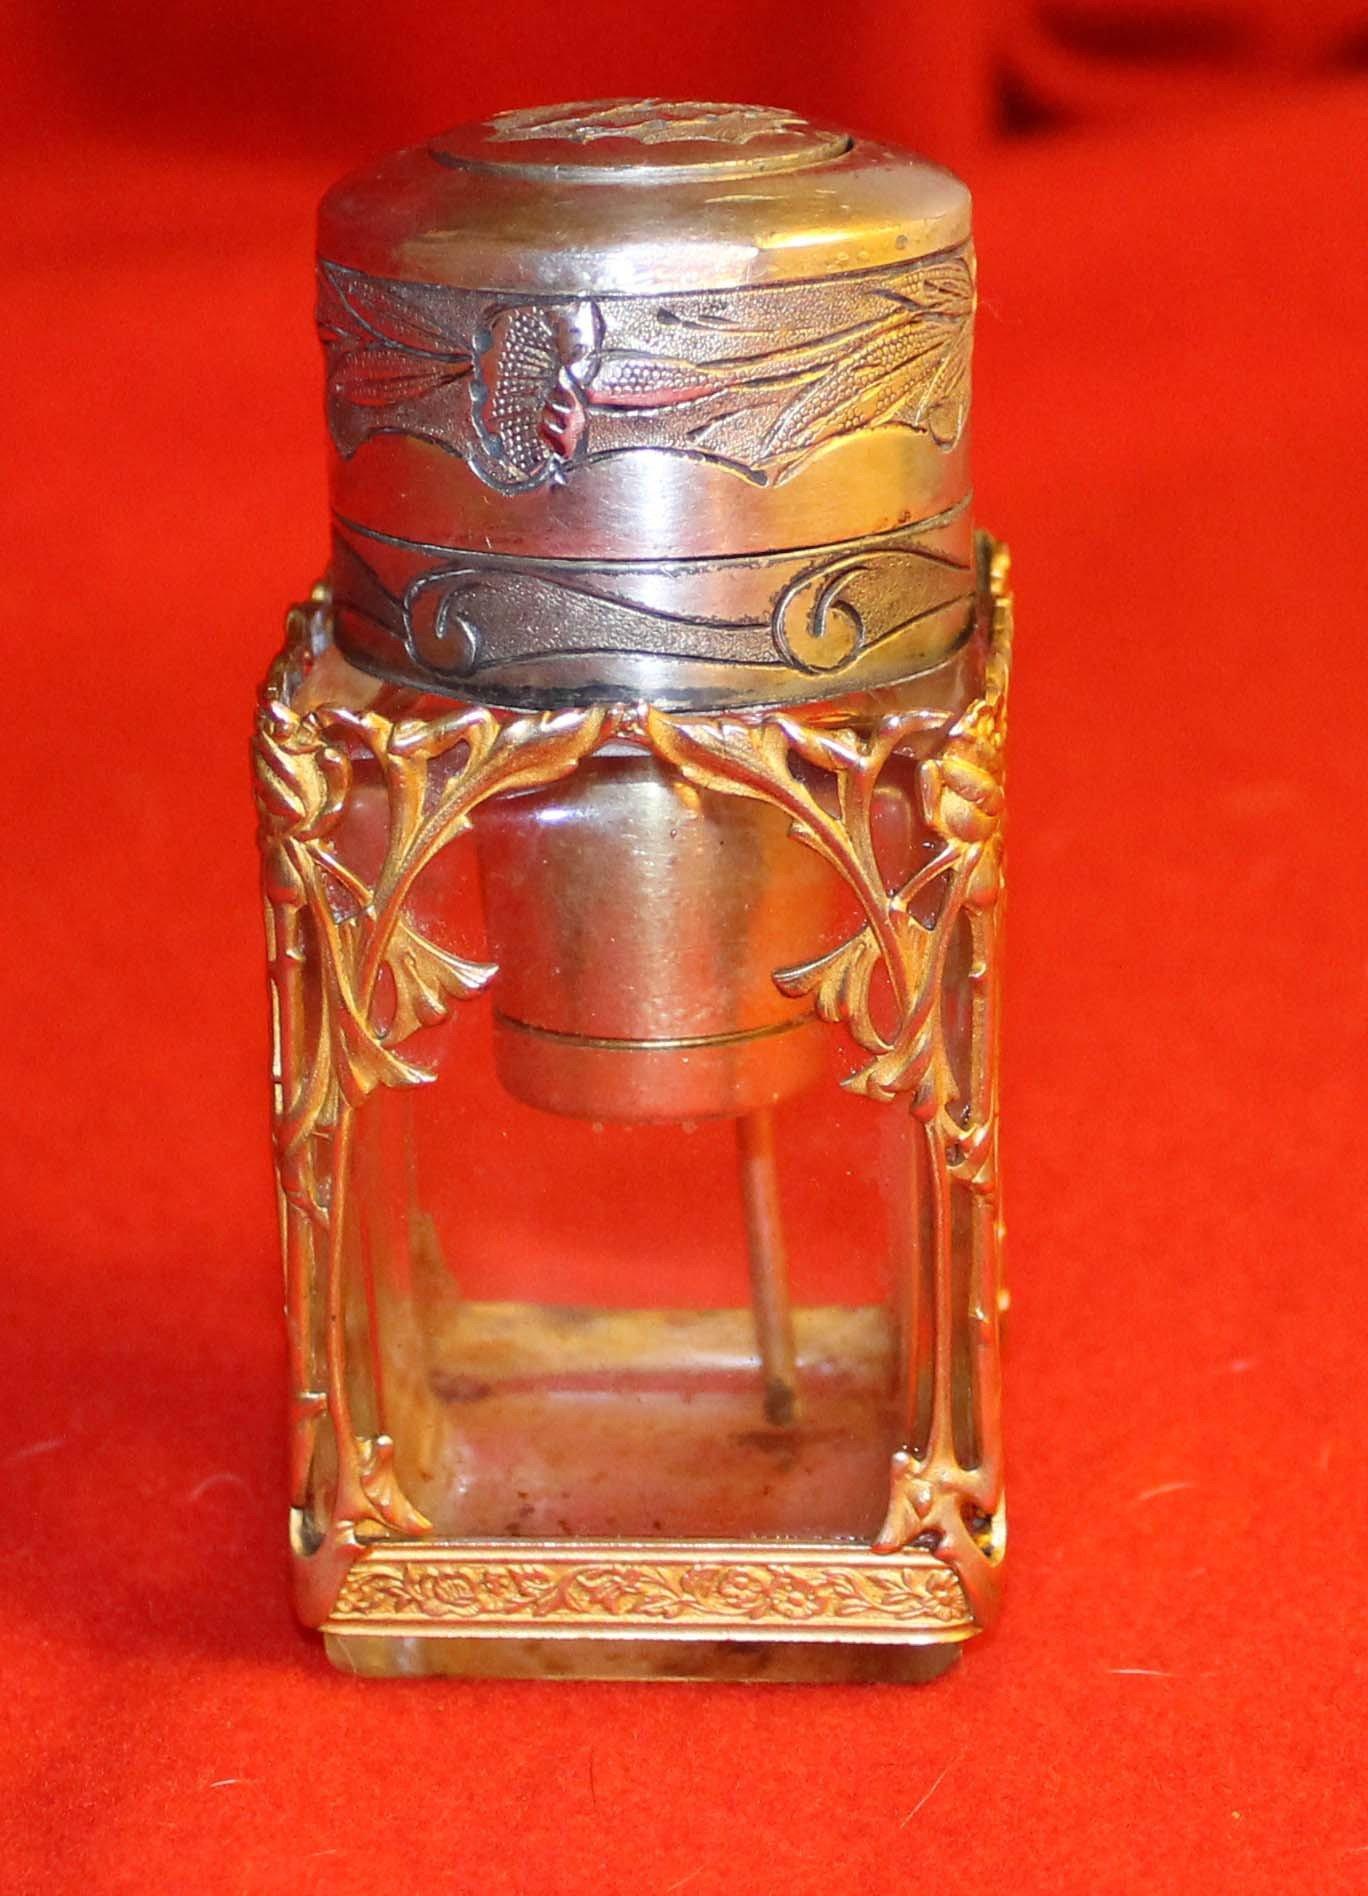 galerie-bosetti-antiquites, vaporisateur art nouveau, face 3